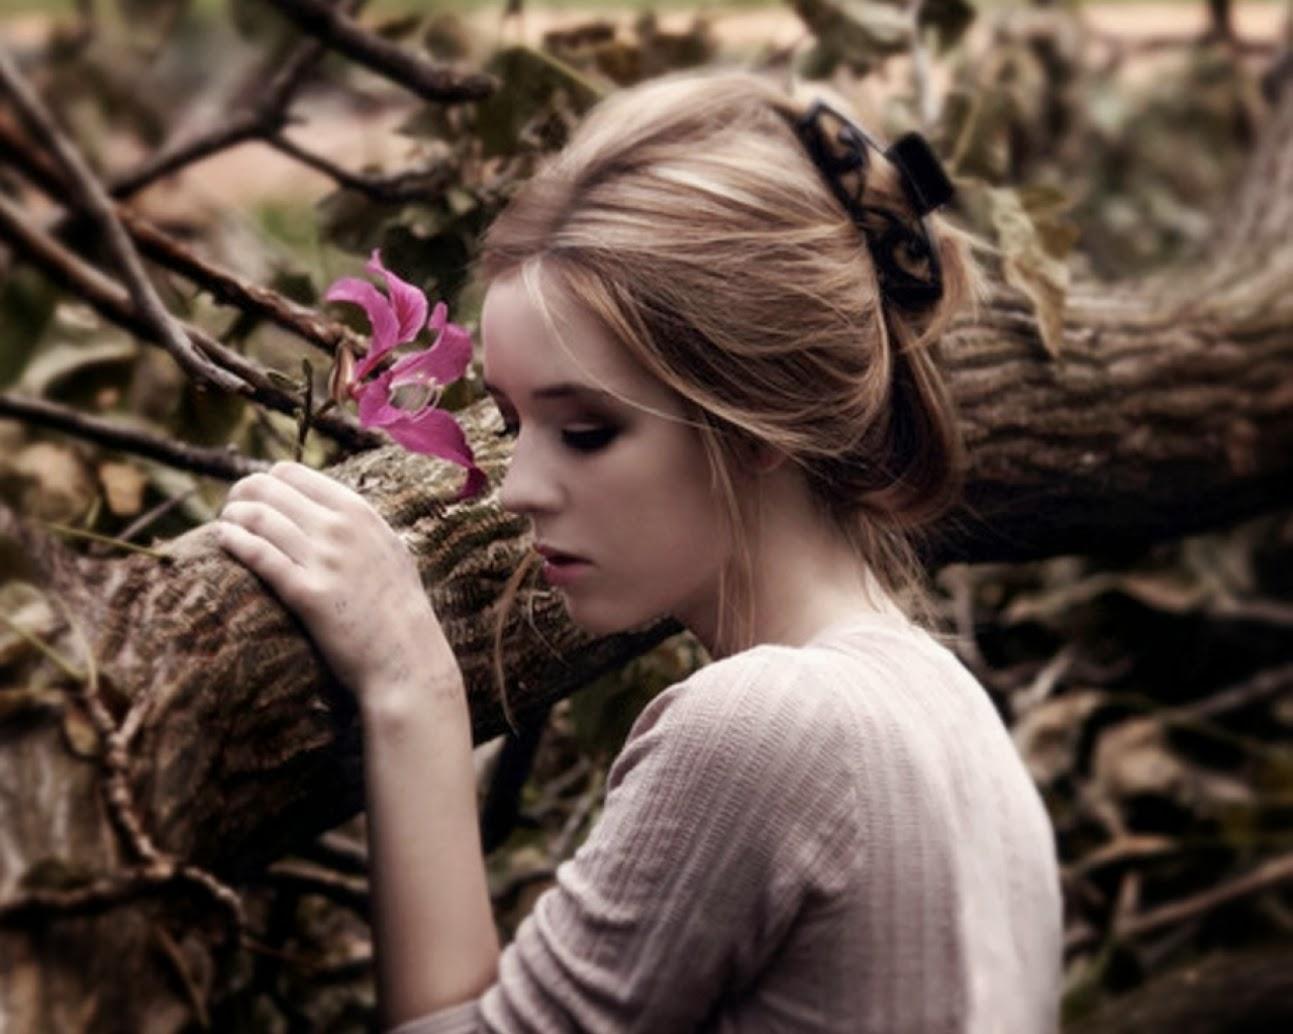 Sad Girl Pictures And Sad Girl Wallpapers -3614